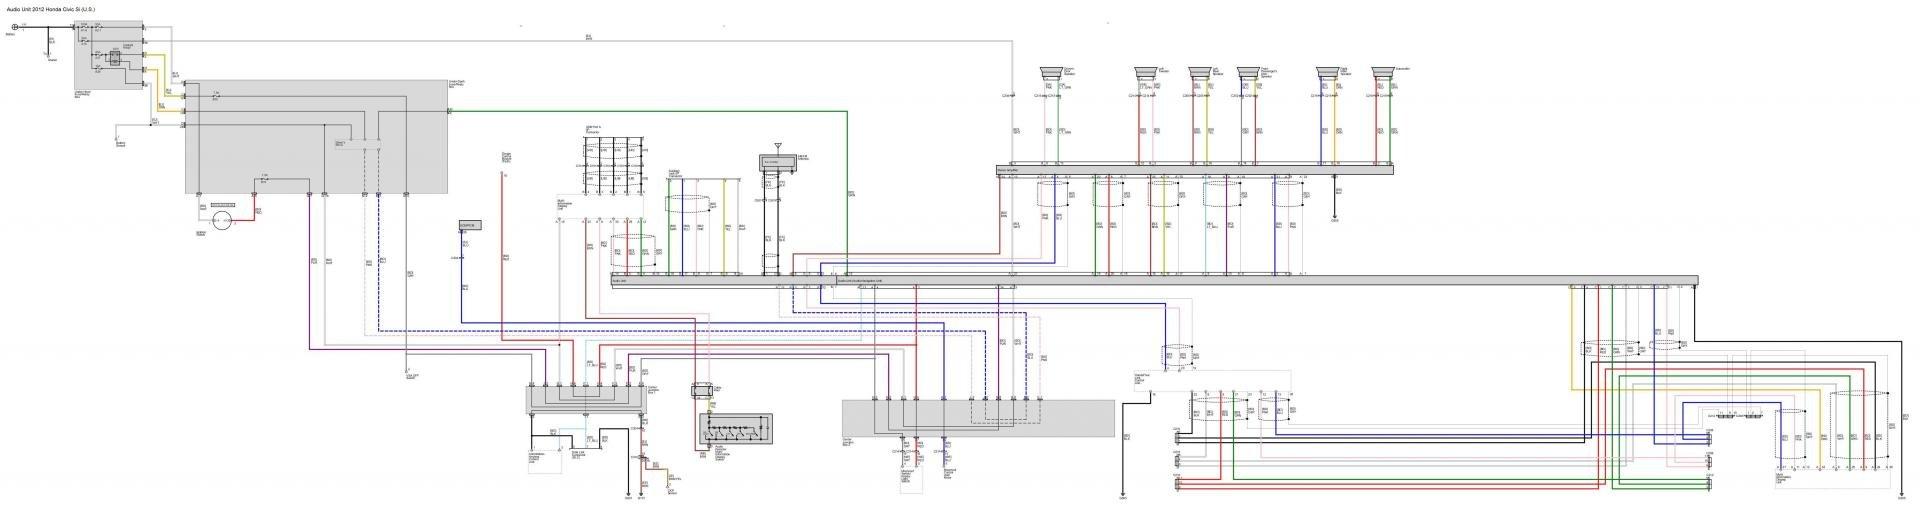 2012 civic wiring diagram audio wiring diagrams post  em if you got  em 9th gen civic forum 2012 honda civic radio wiring diagram audio wiring diagrams post  em if you